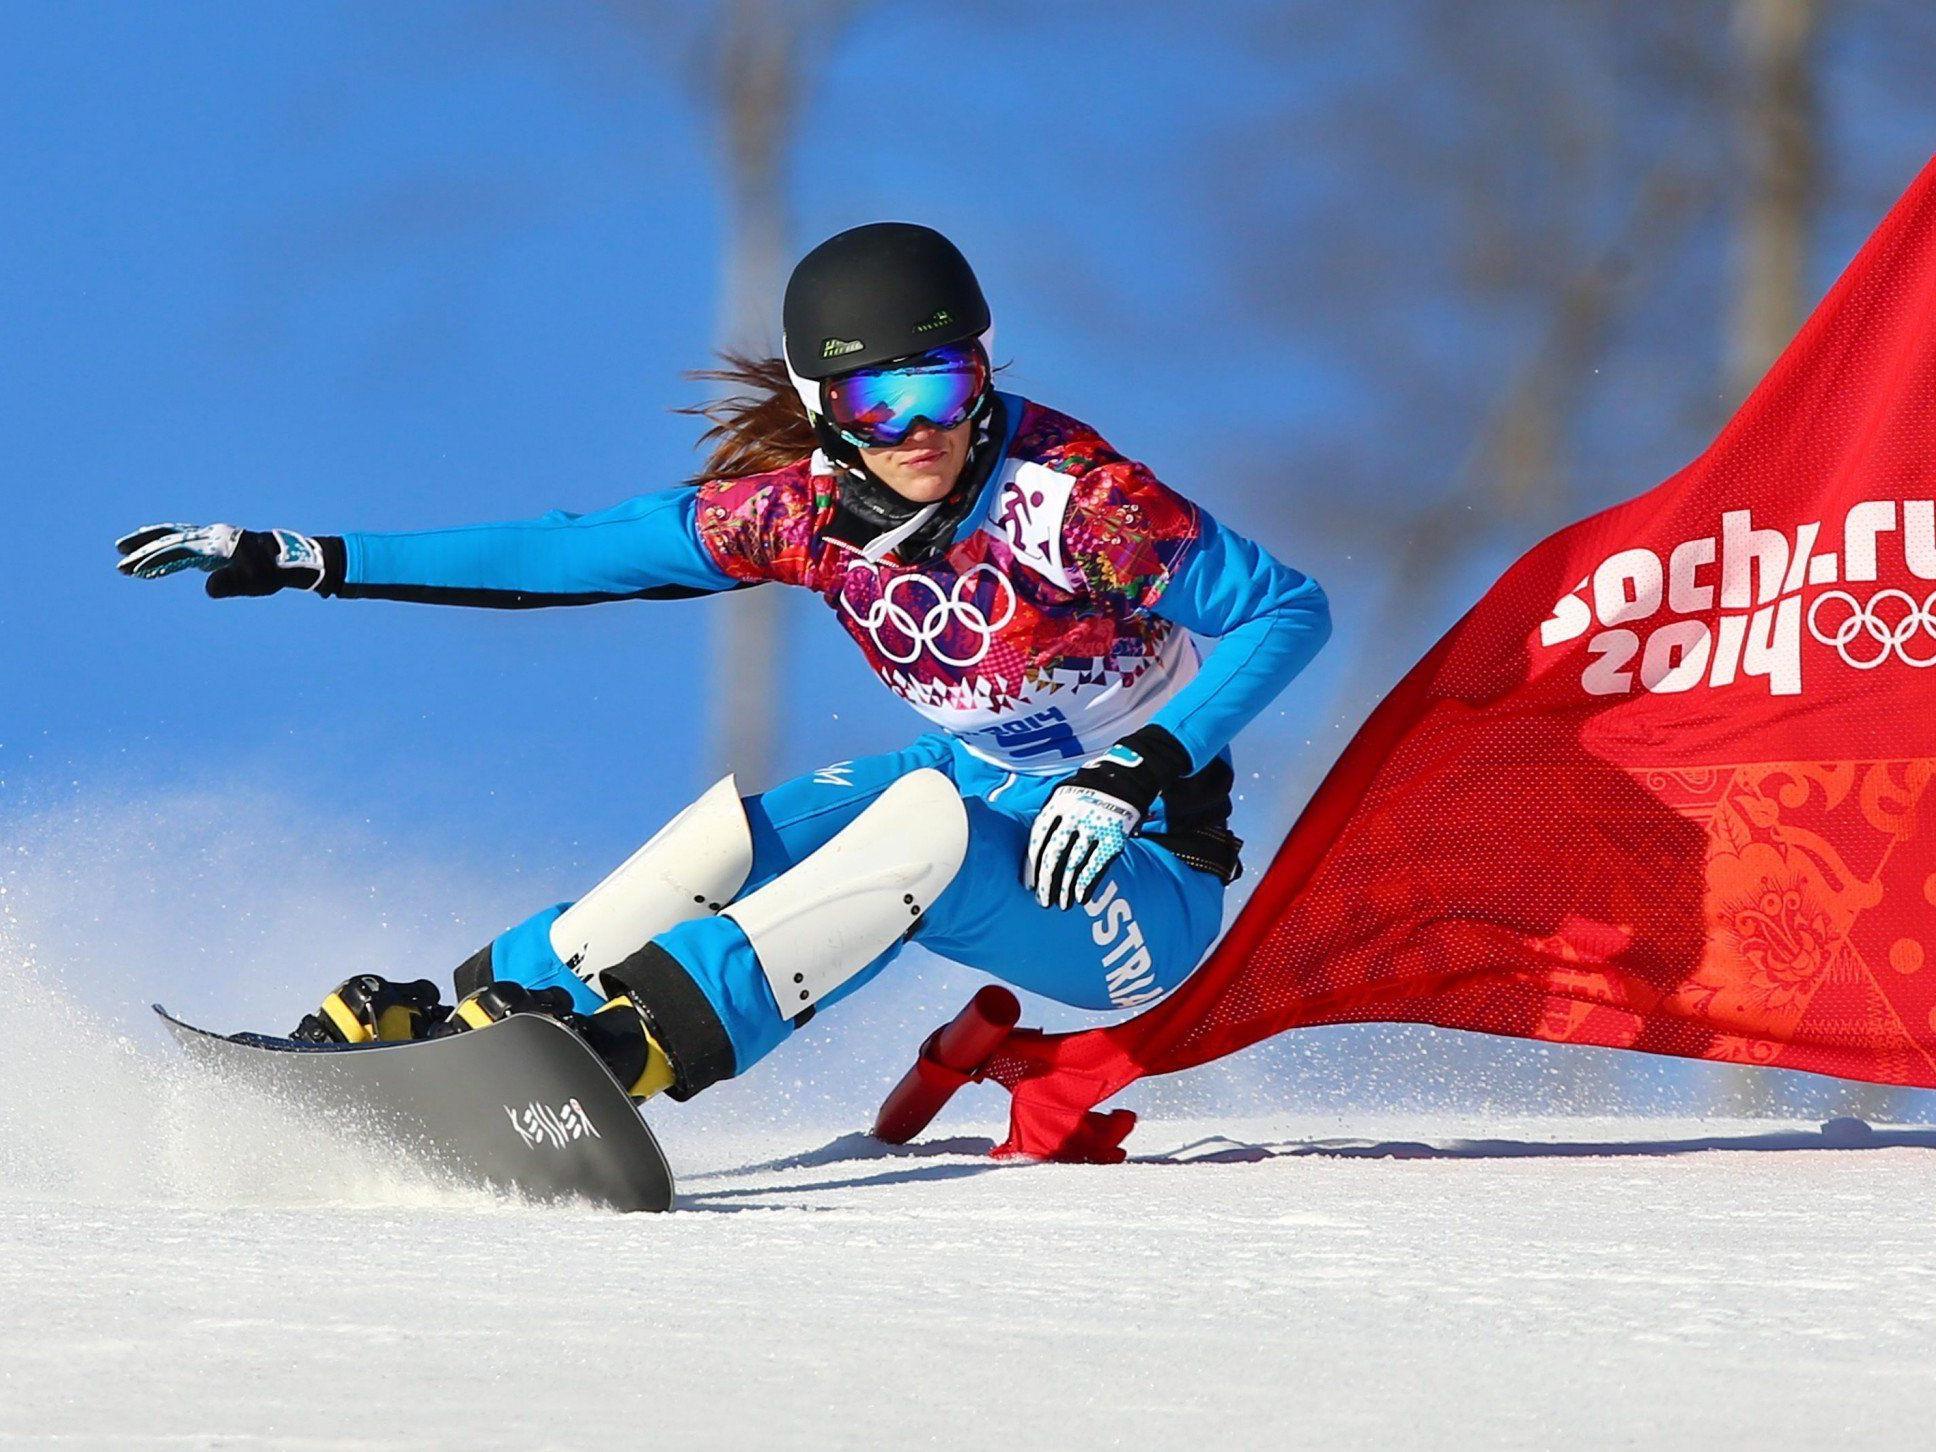 Snowboarderin Dujmovits holte Gold im Parallel-Slalom.